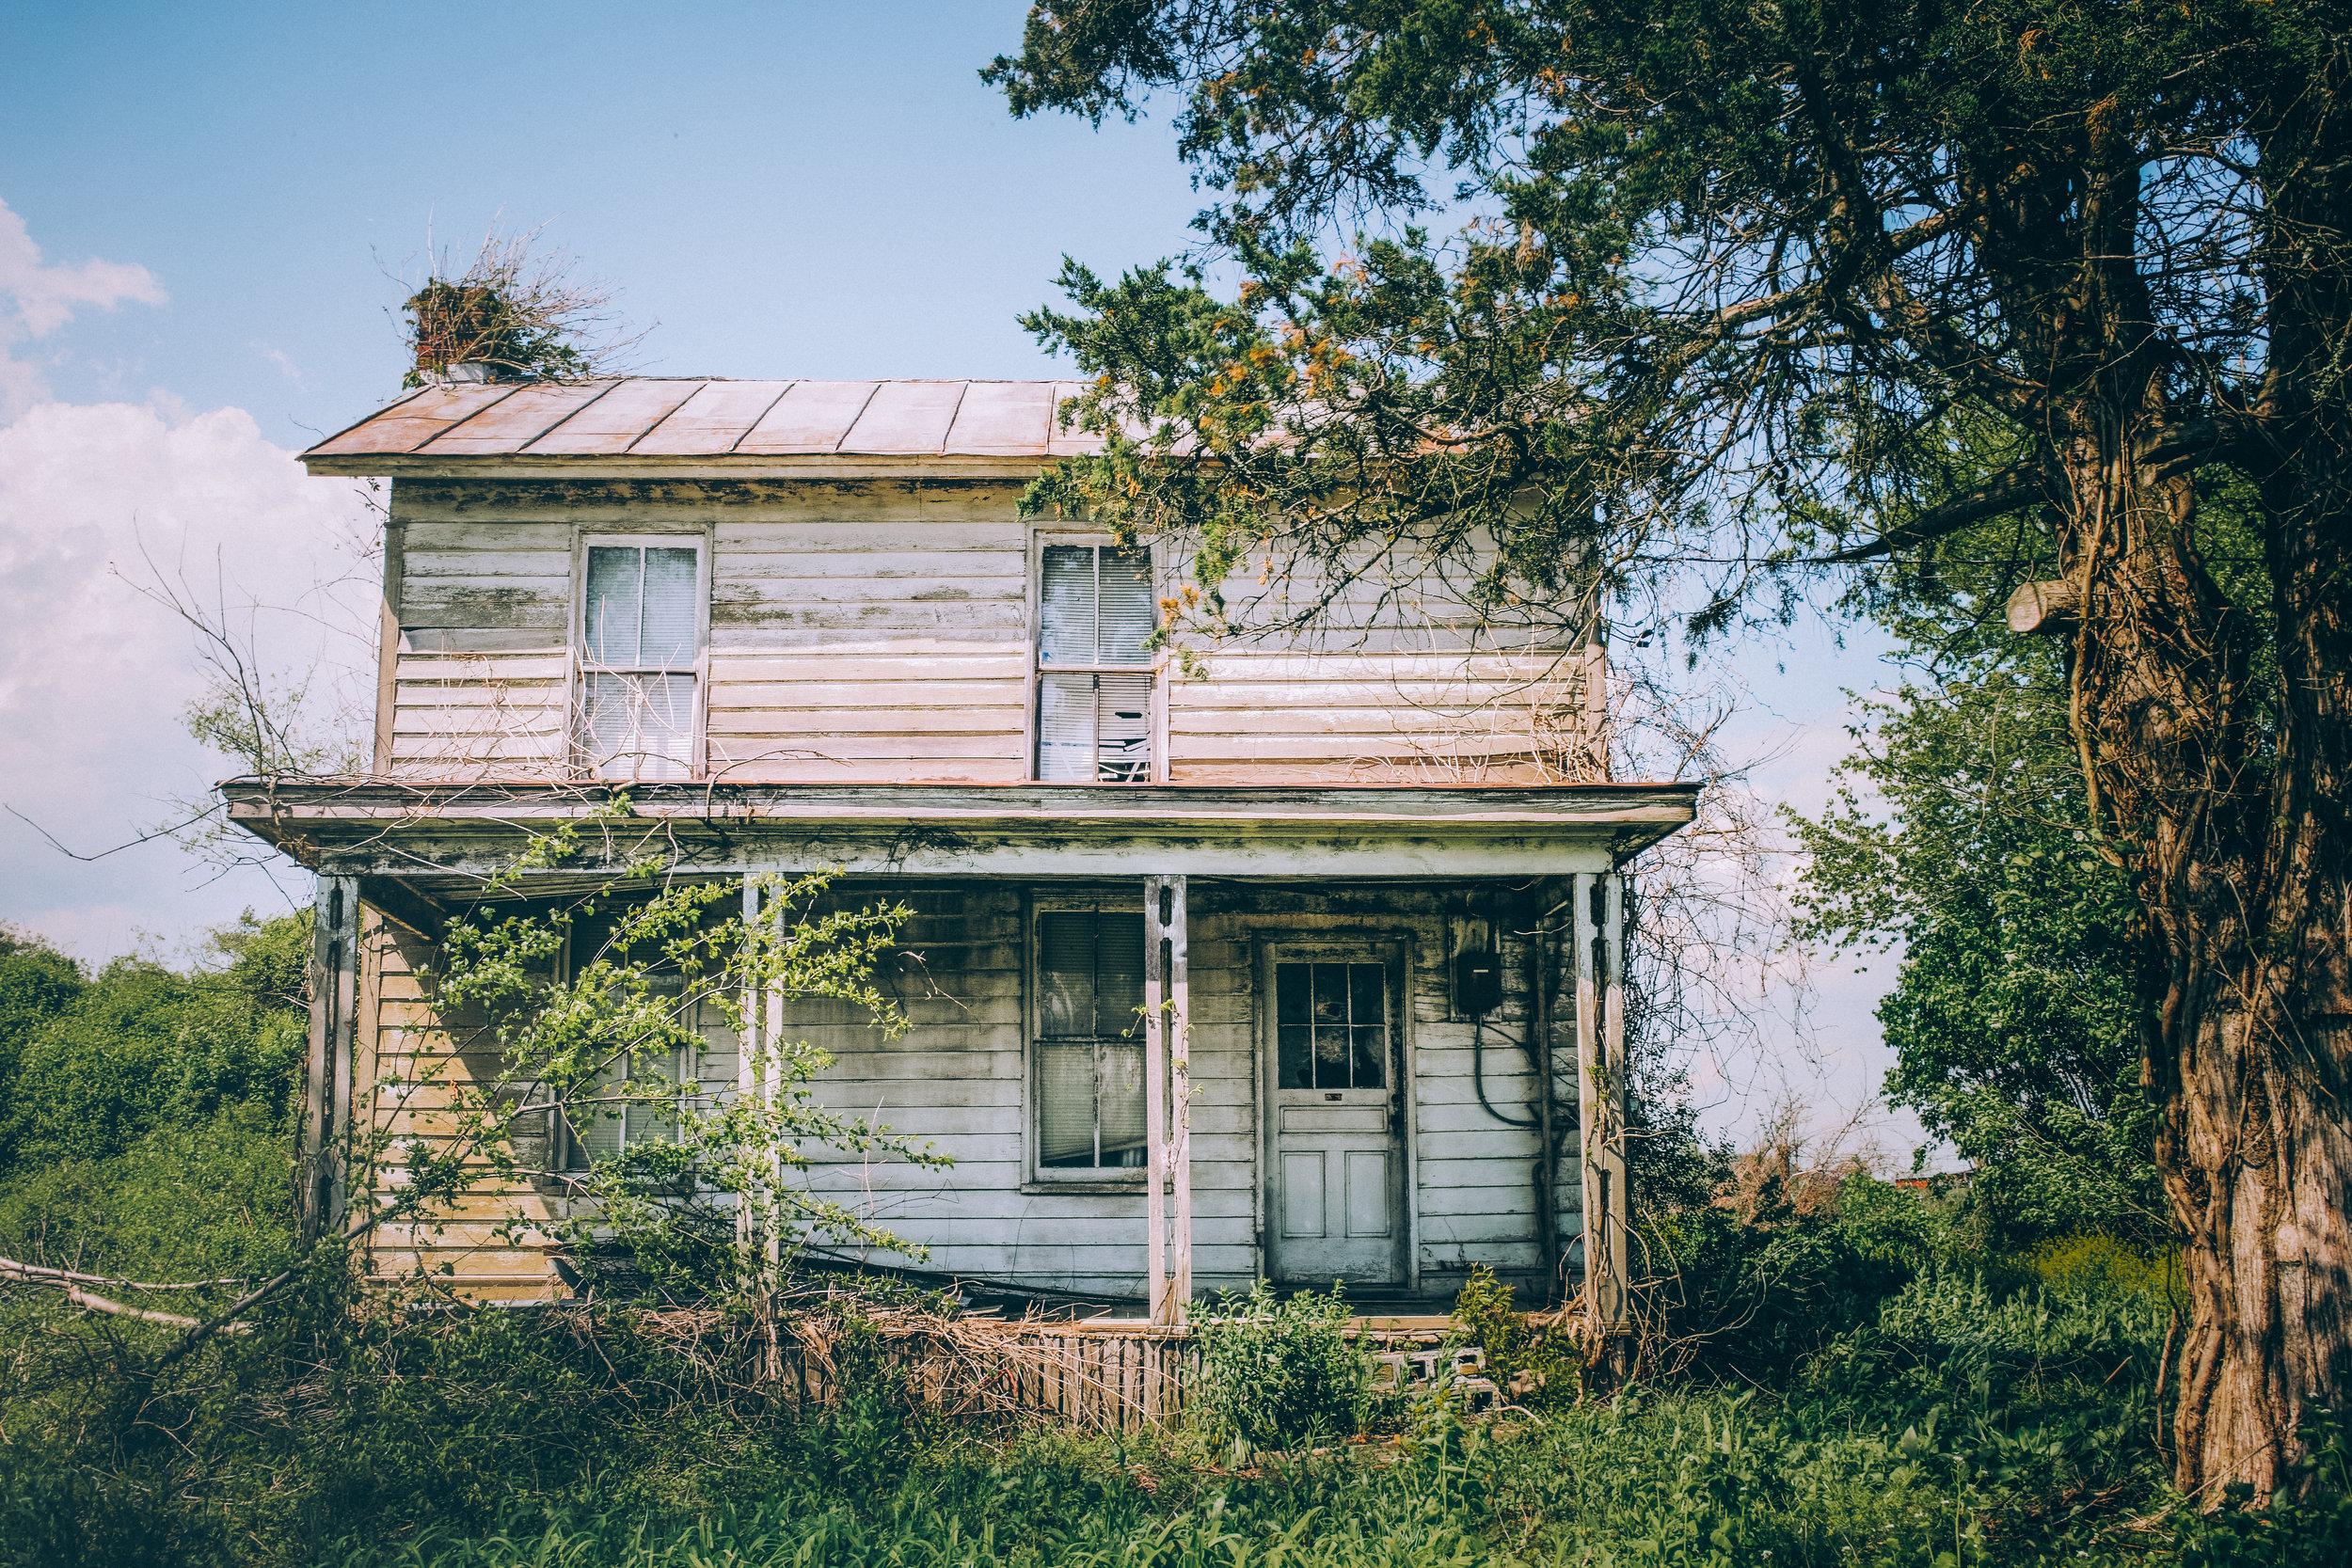 kw-abandoned-va-2019-img8.jpg